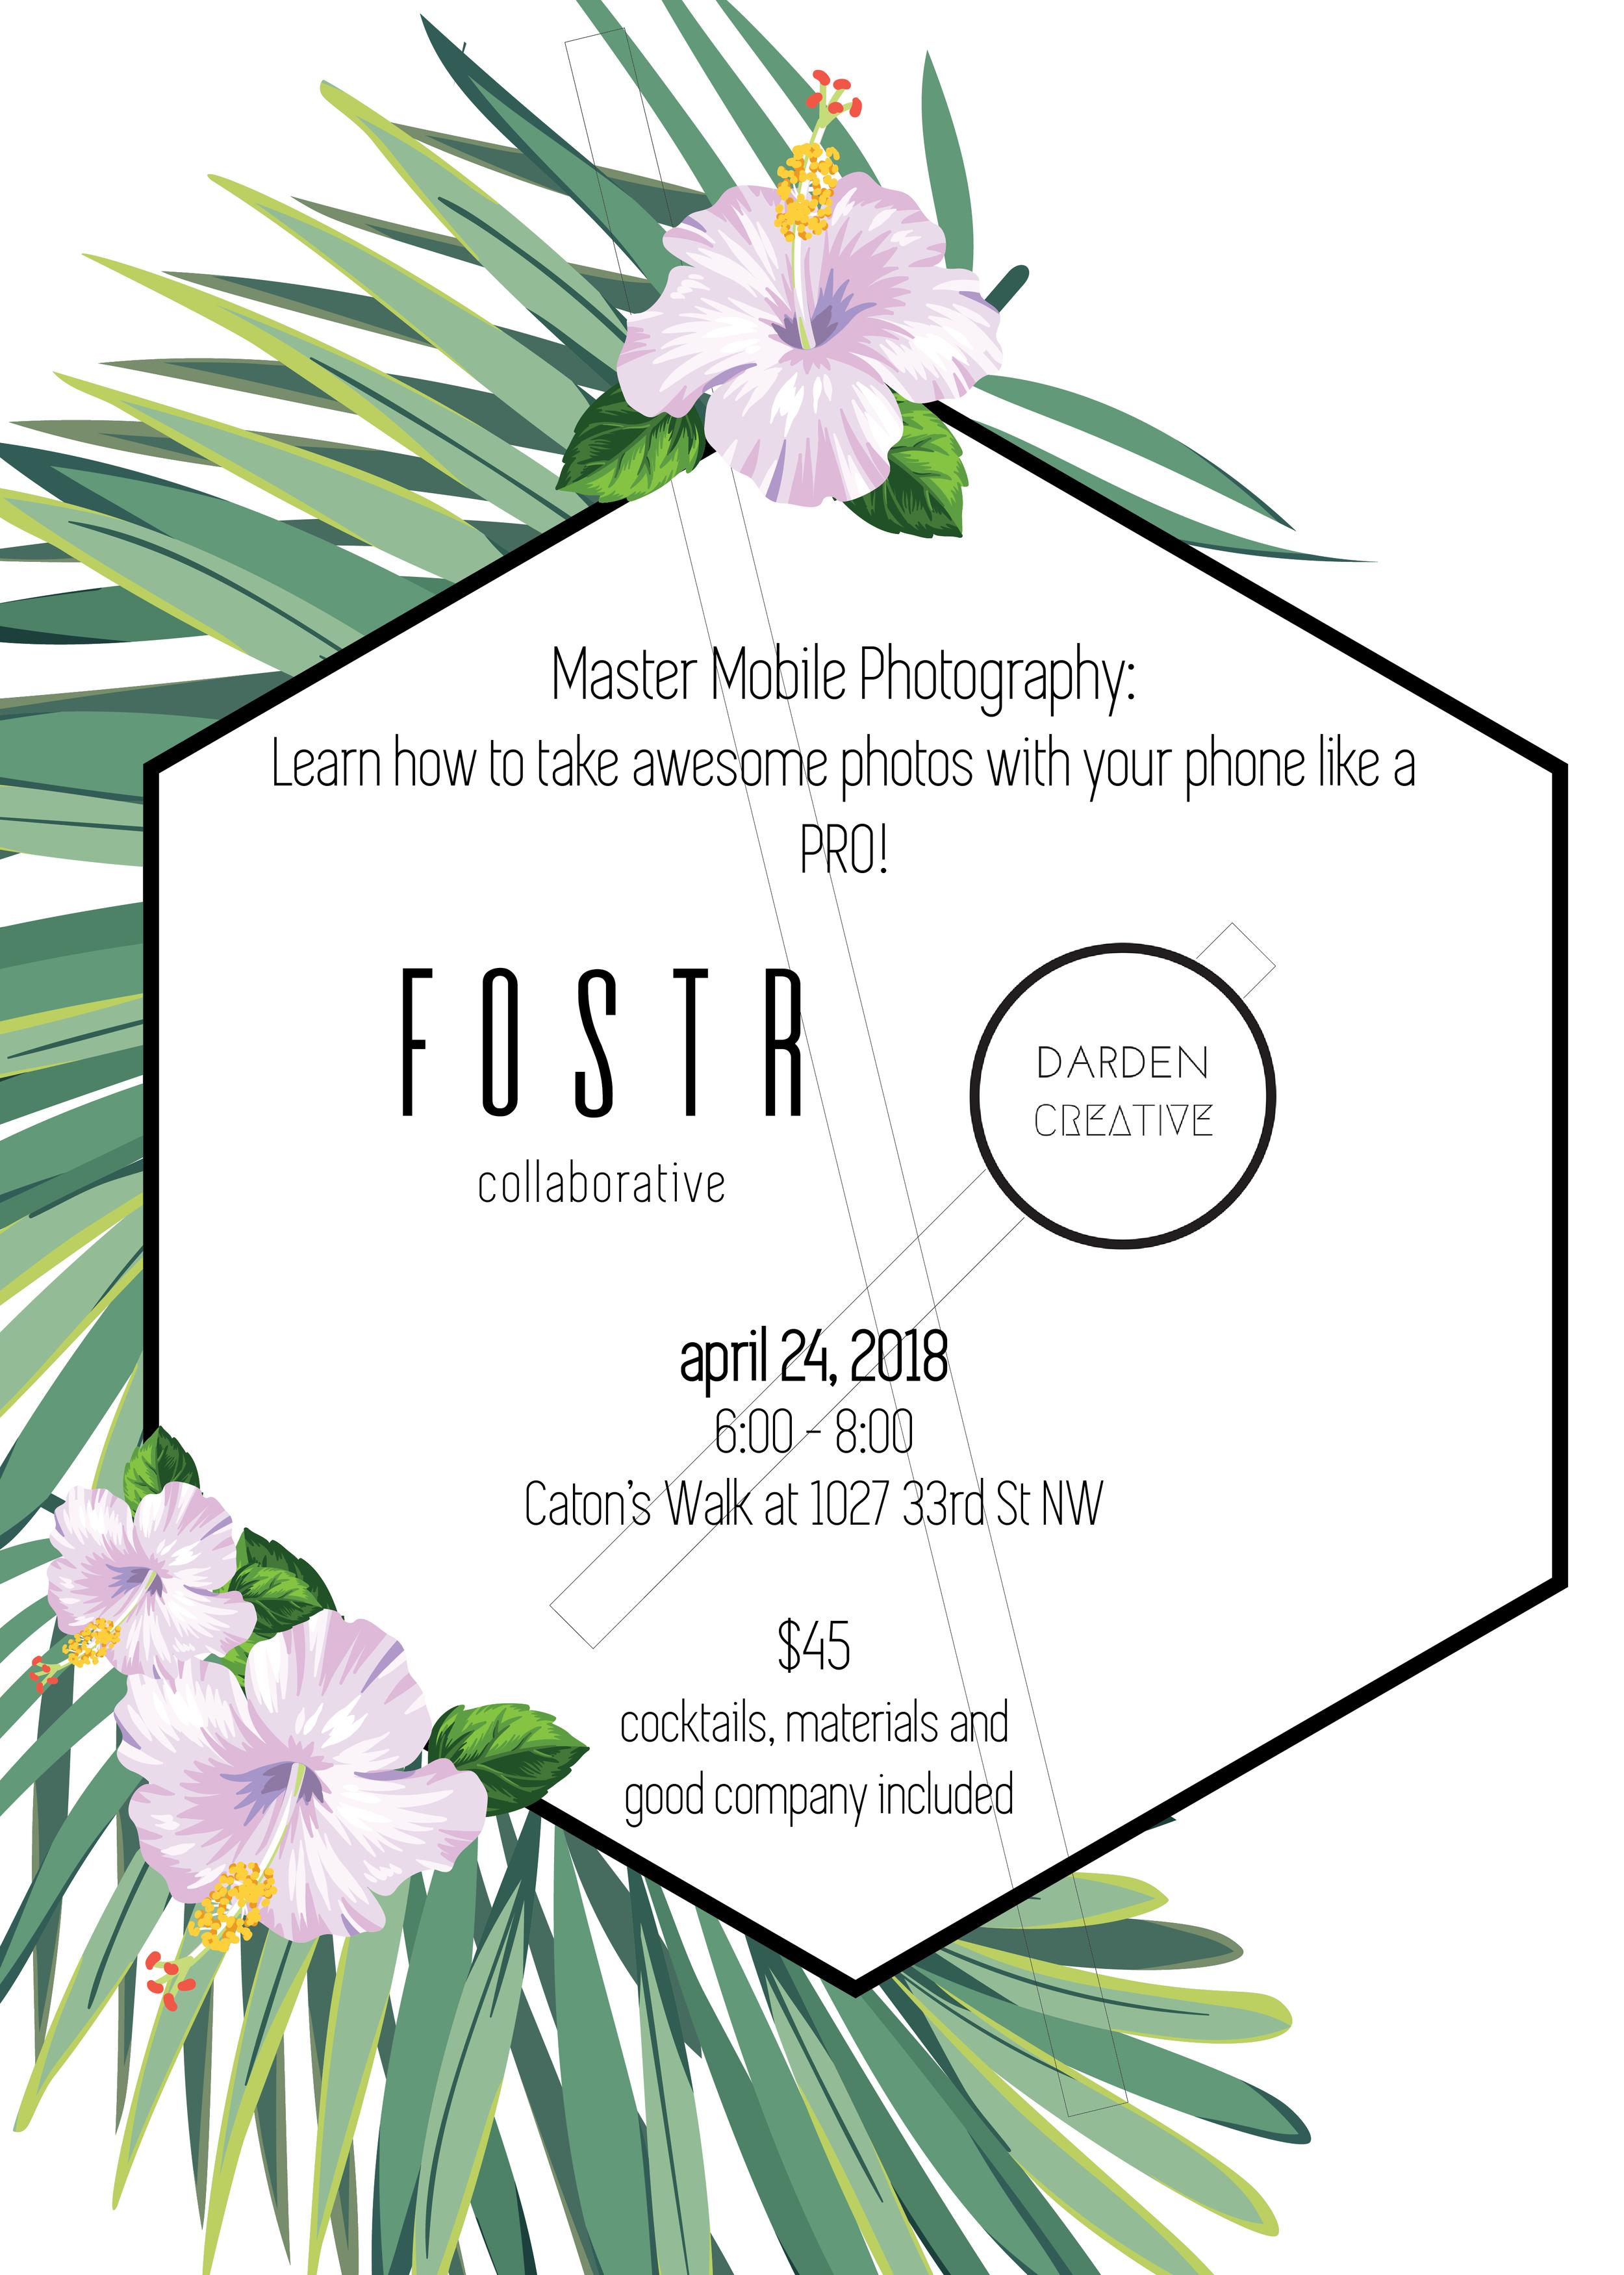 fostr_workshop_graphics darden 042419-01.png